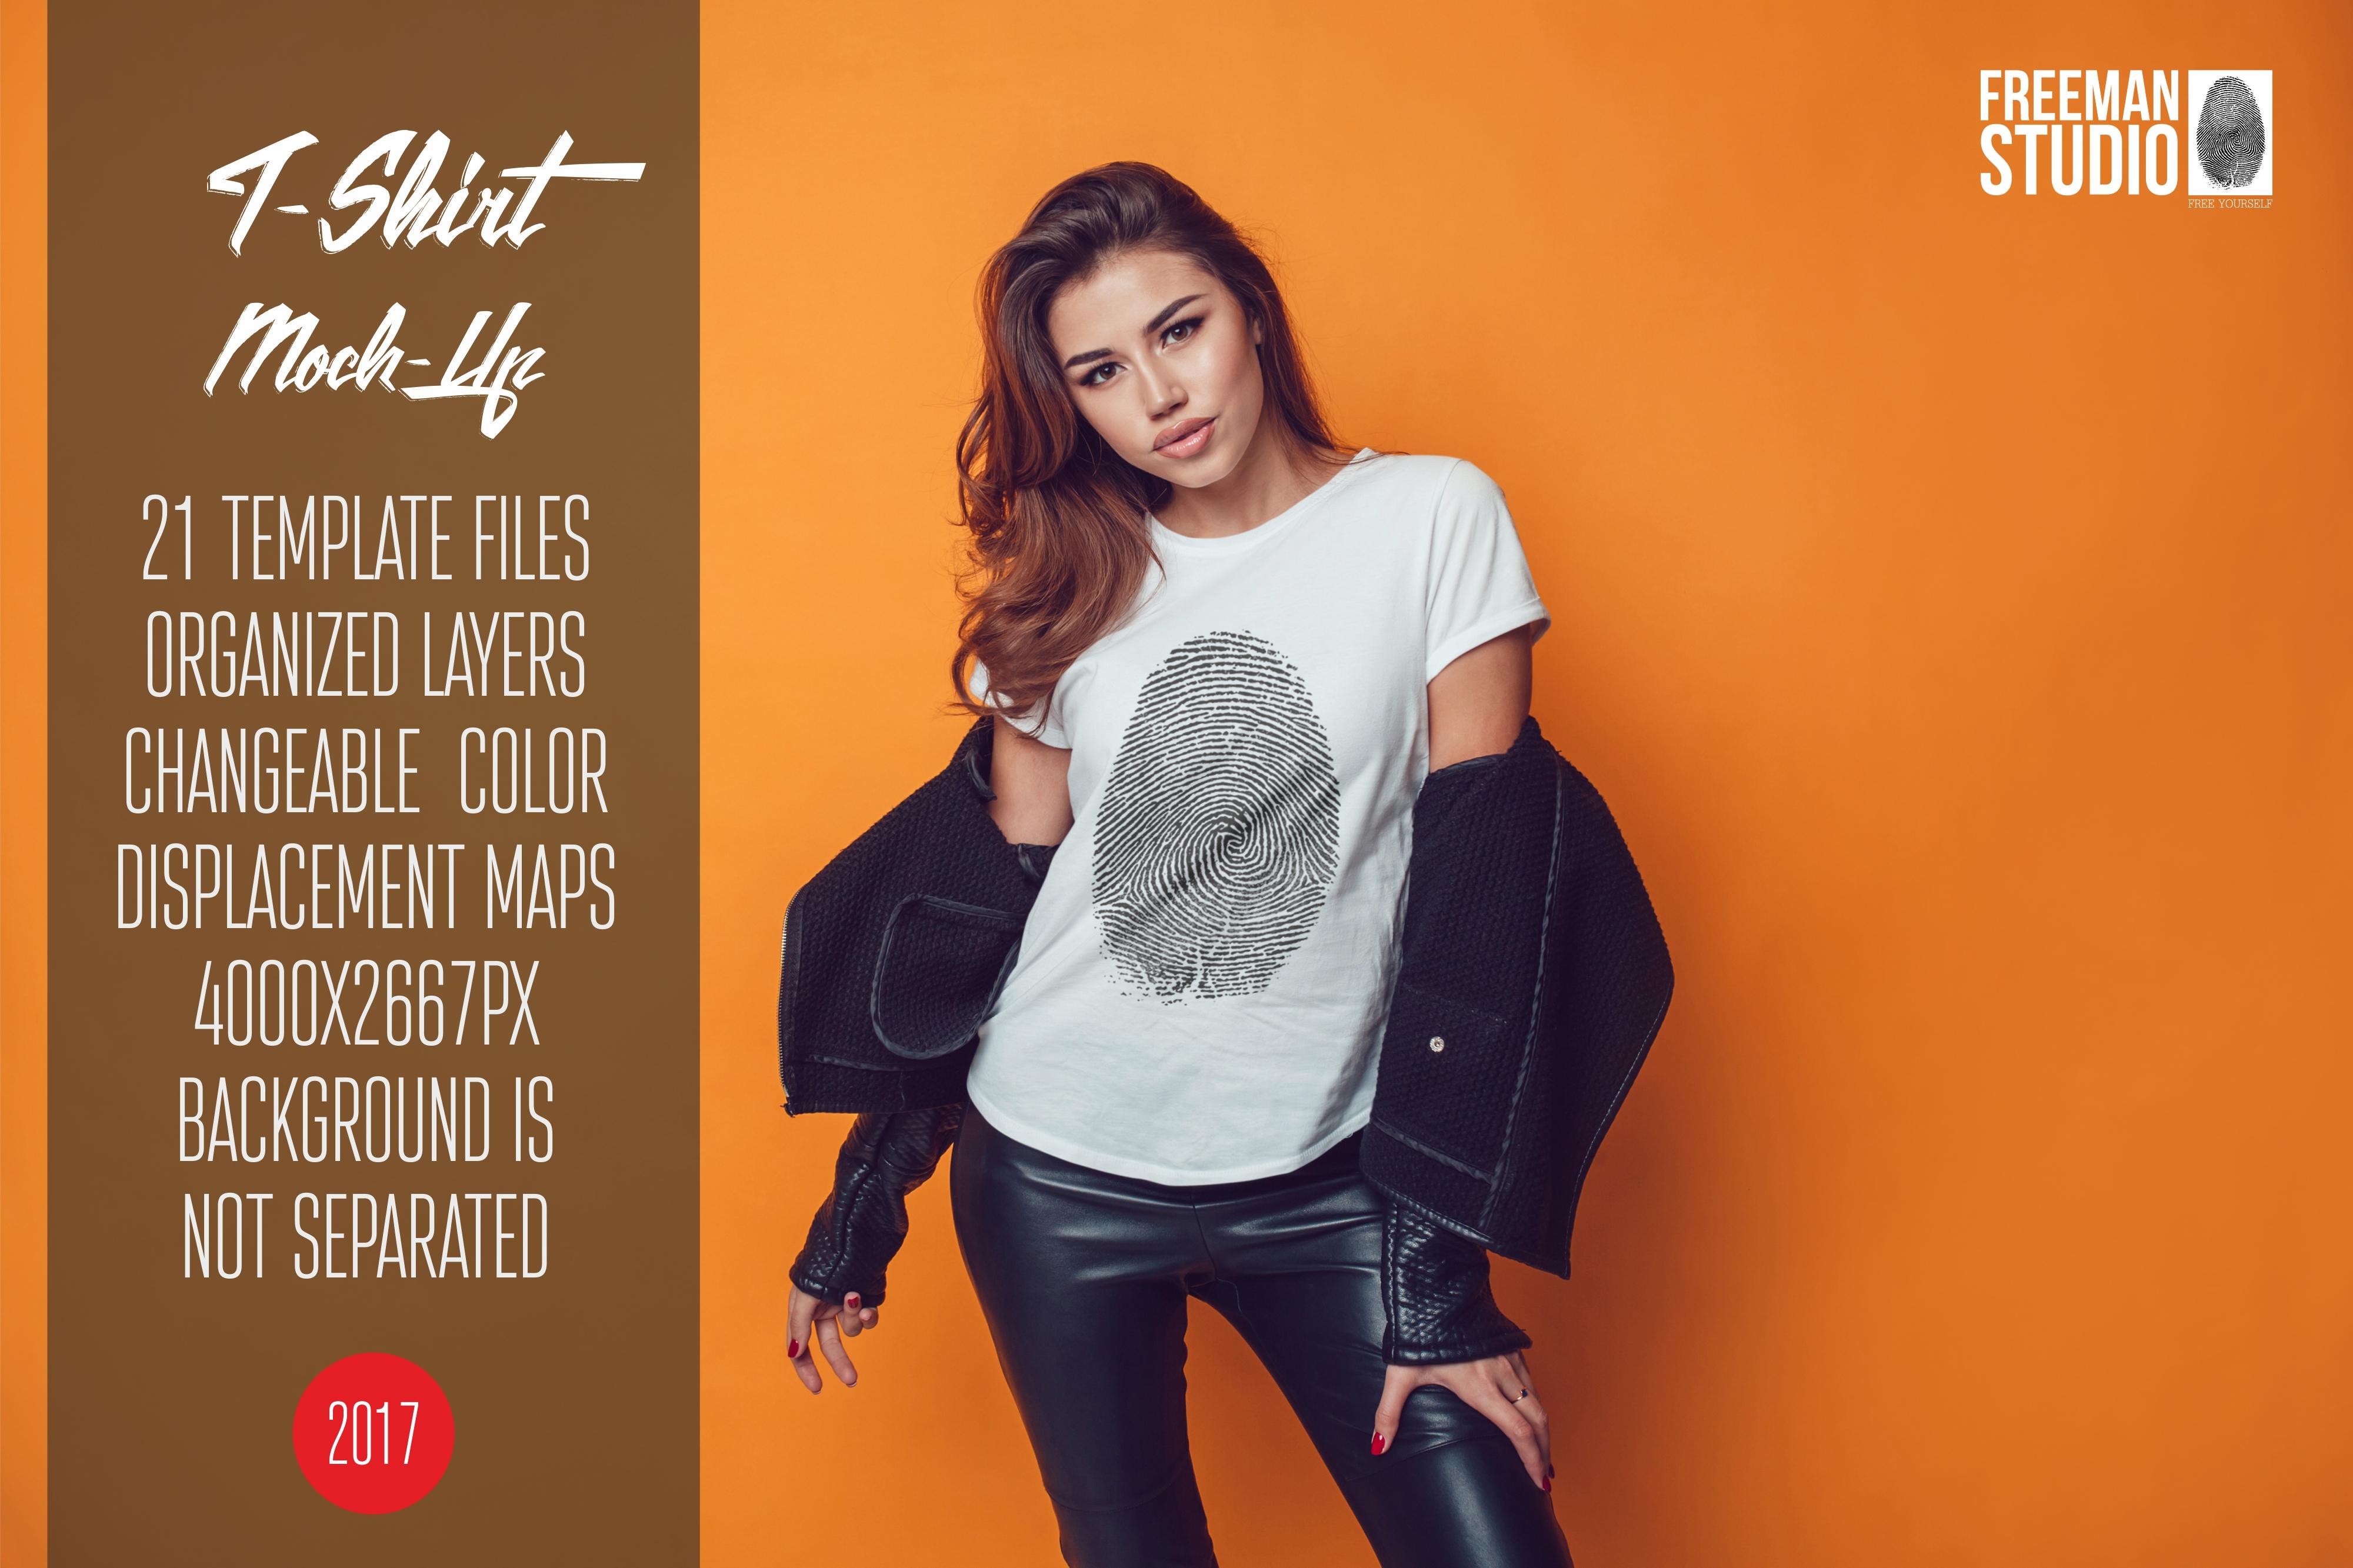 T-Shirt Mock-Up Vol.22 2017 example image 1